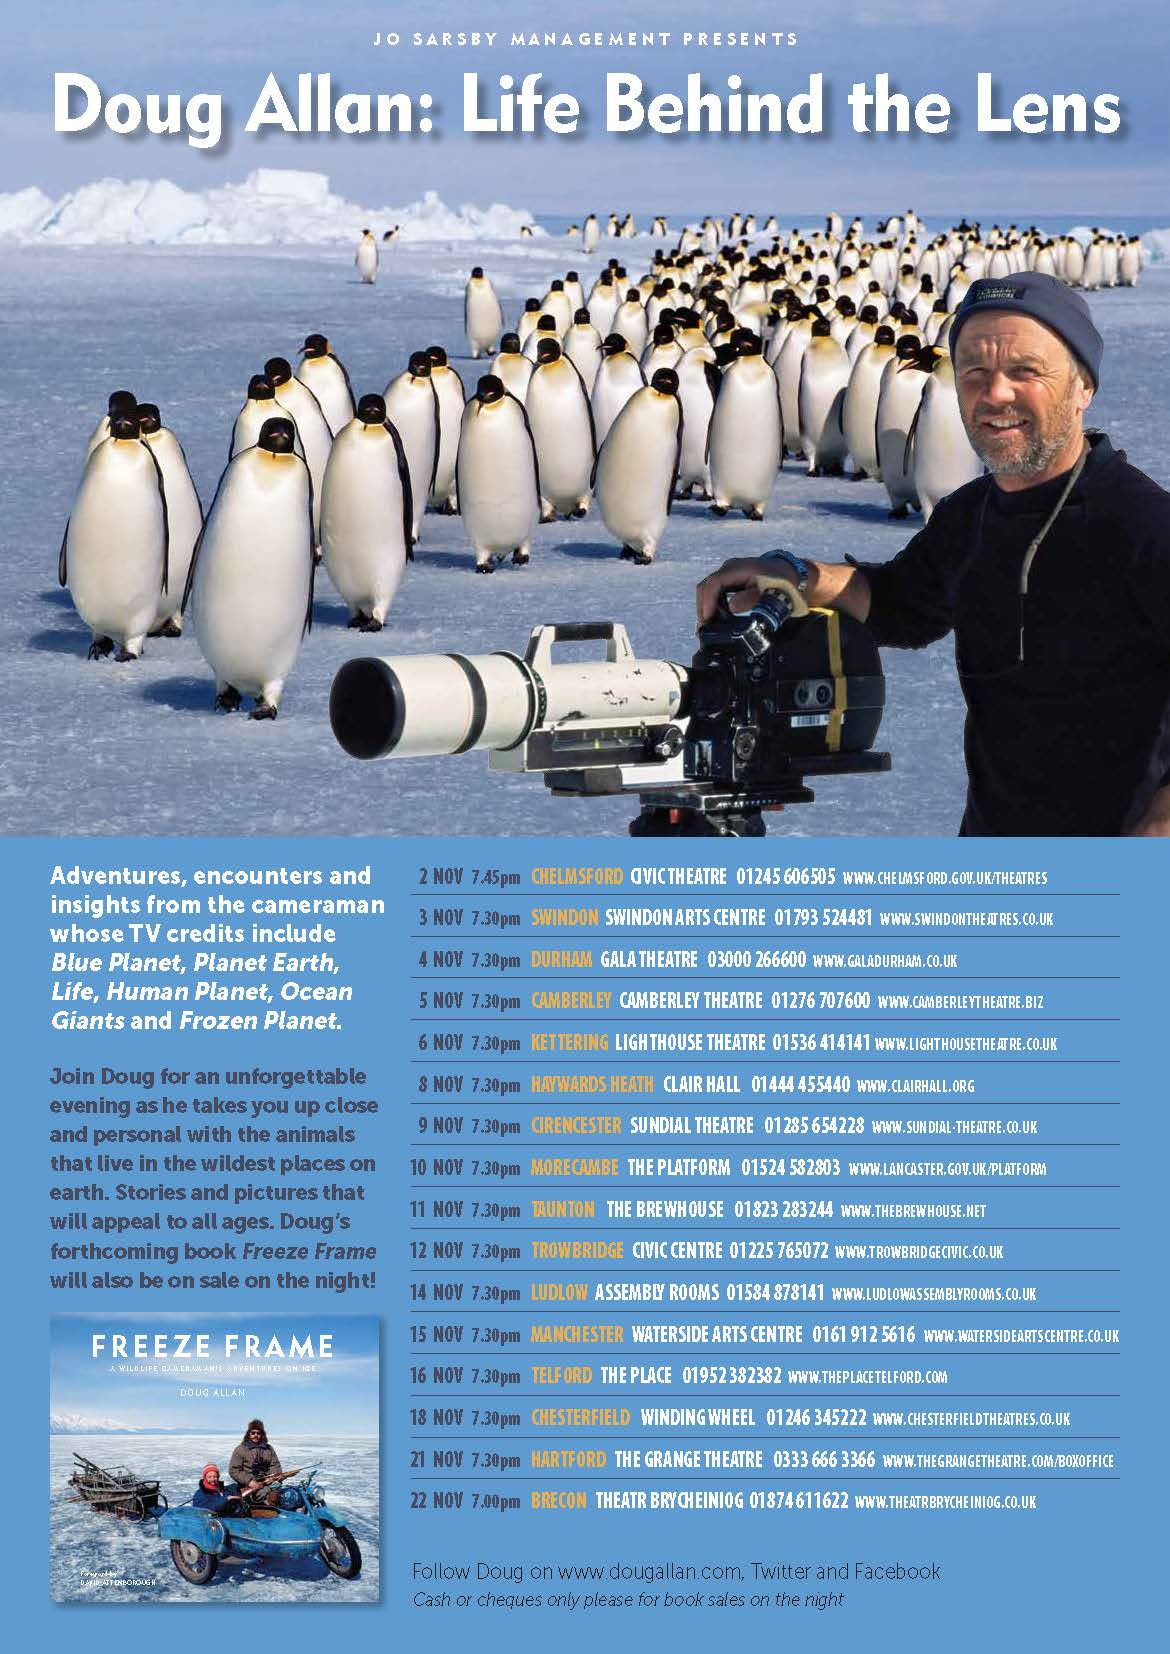 Doug Allan 2015 UK tour poster.jpg